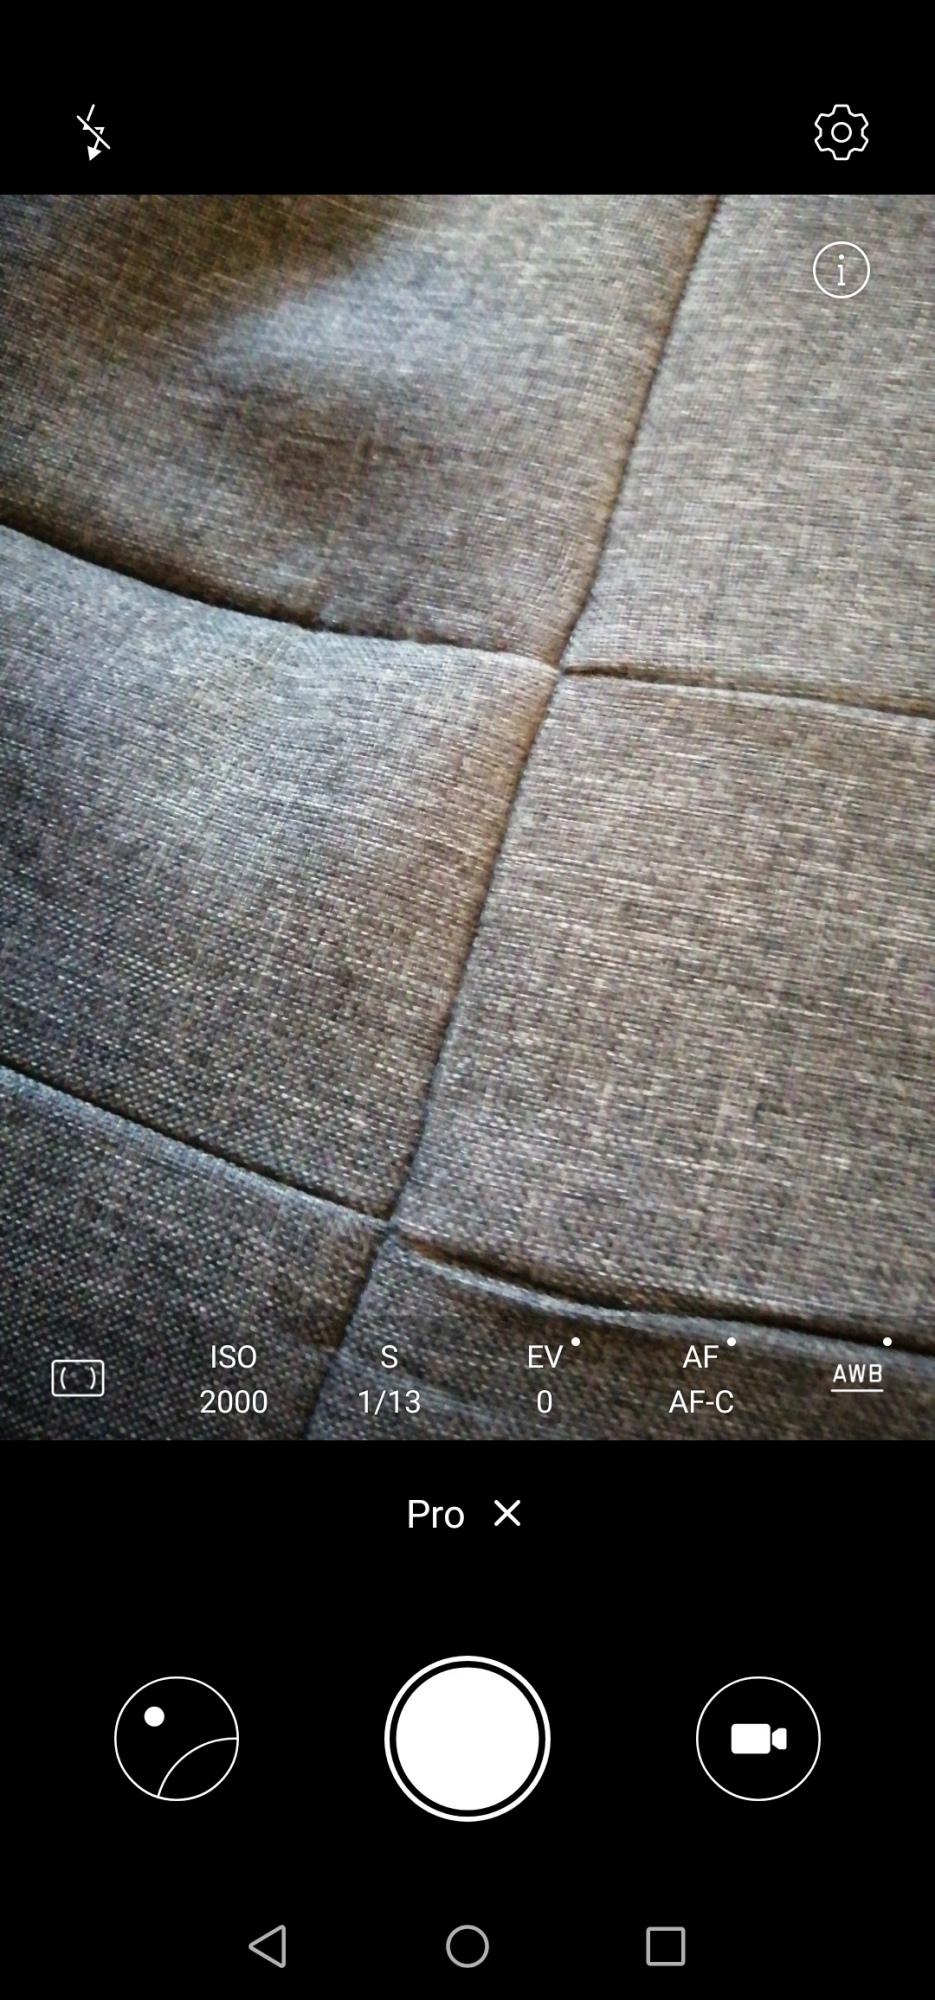 Screenshot_20200523_072346_com.huawei.camera.thumb.jpg.789243708a7ed22cad55f8cf00445901.jpg